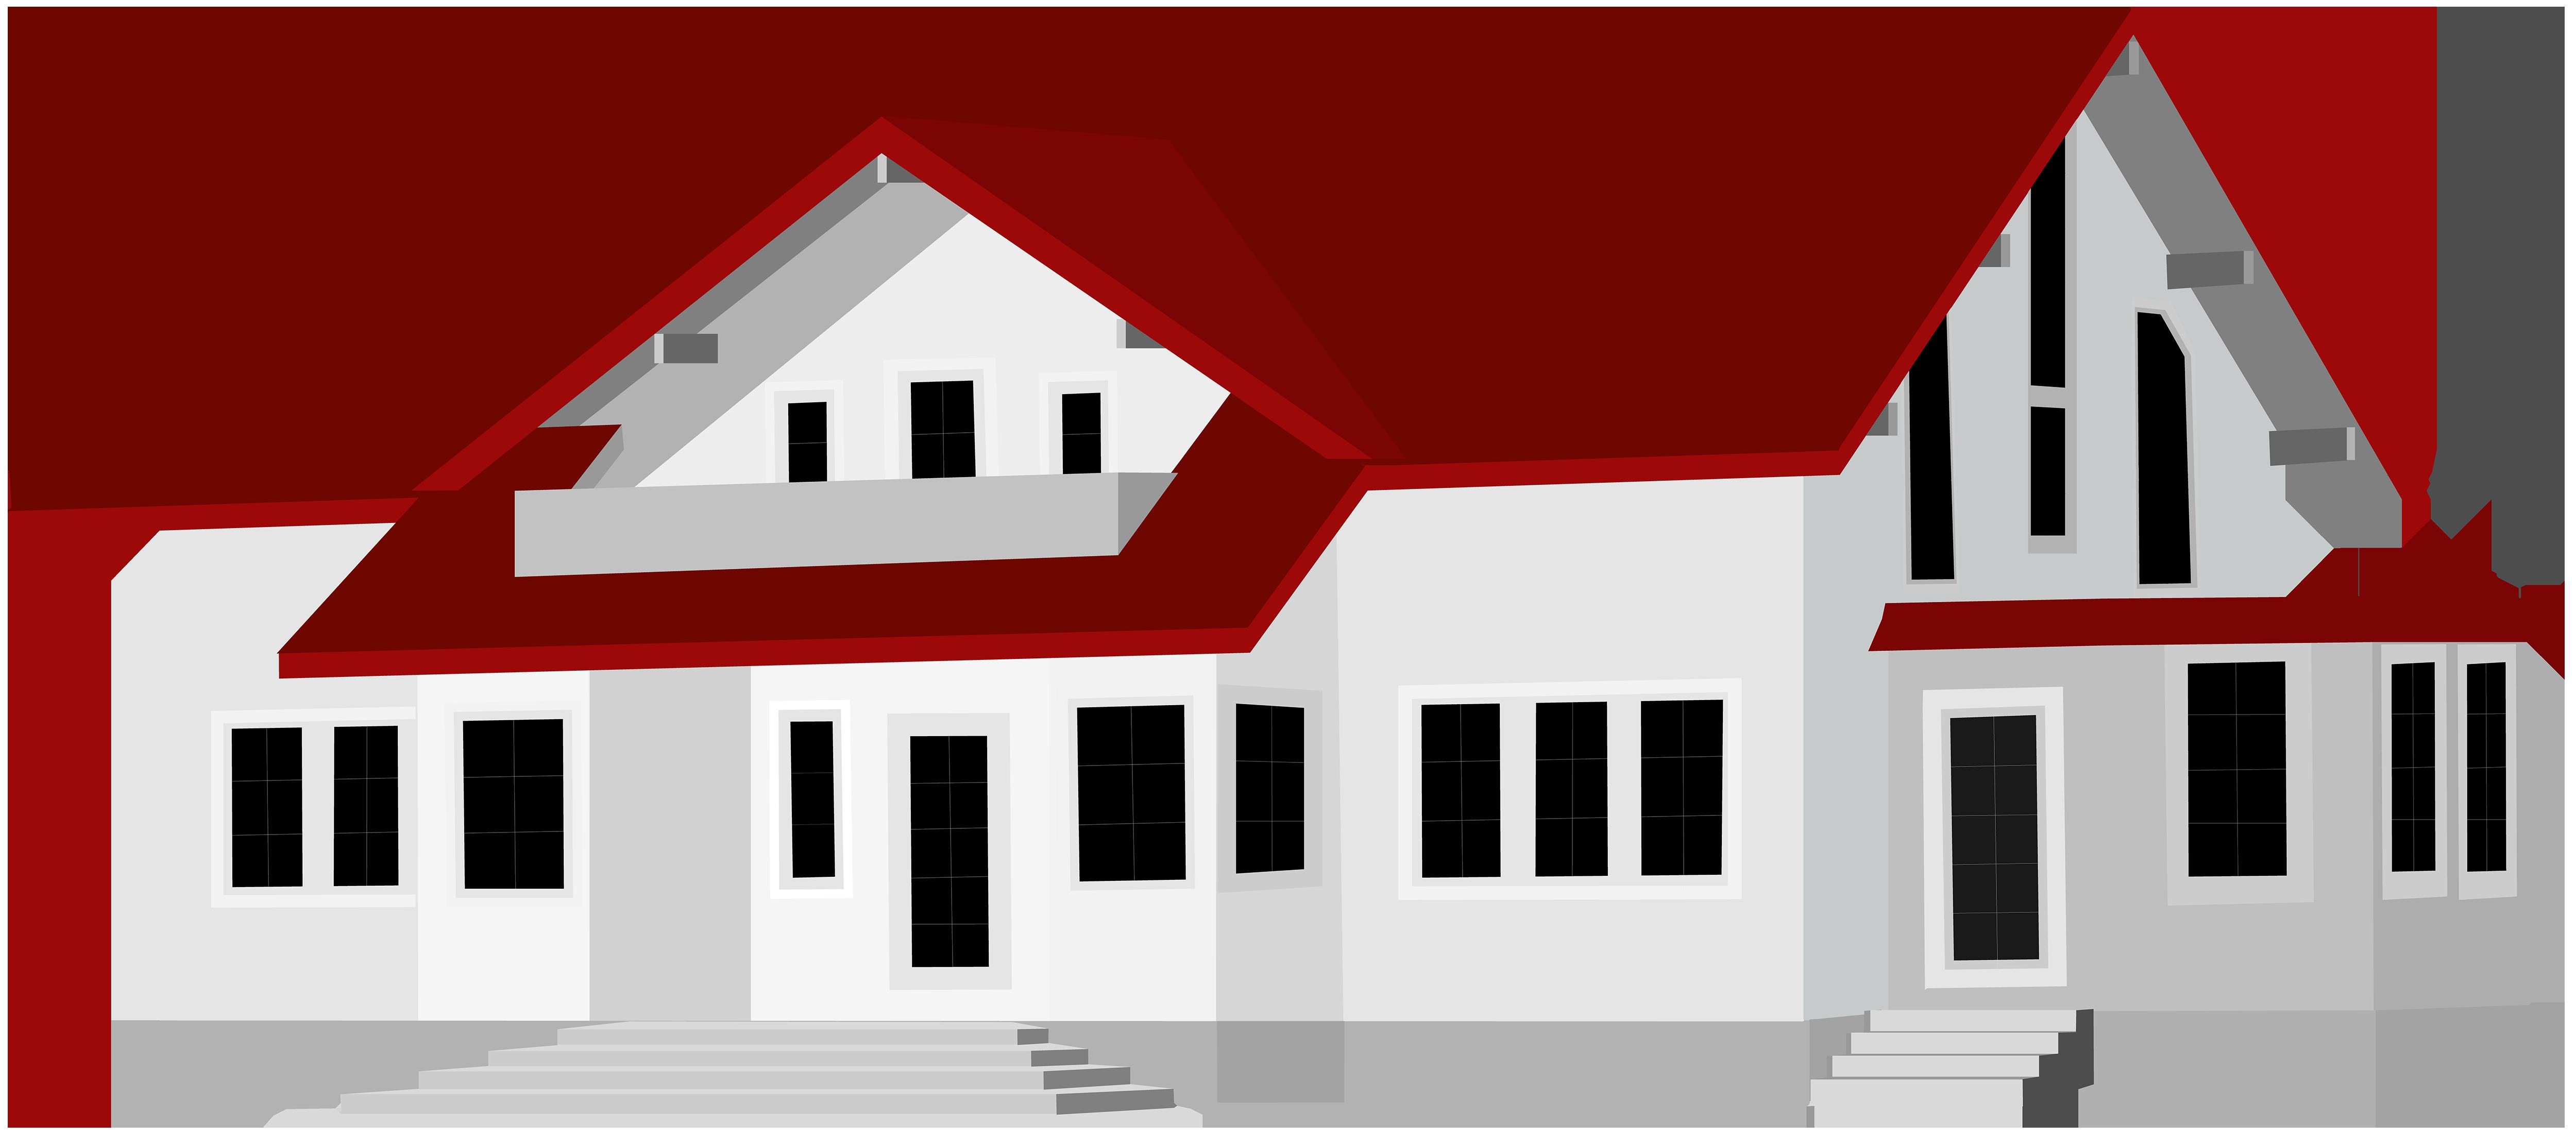 5000x2211 Large House Png Clip Art